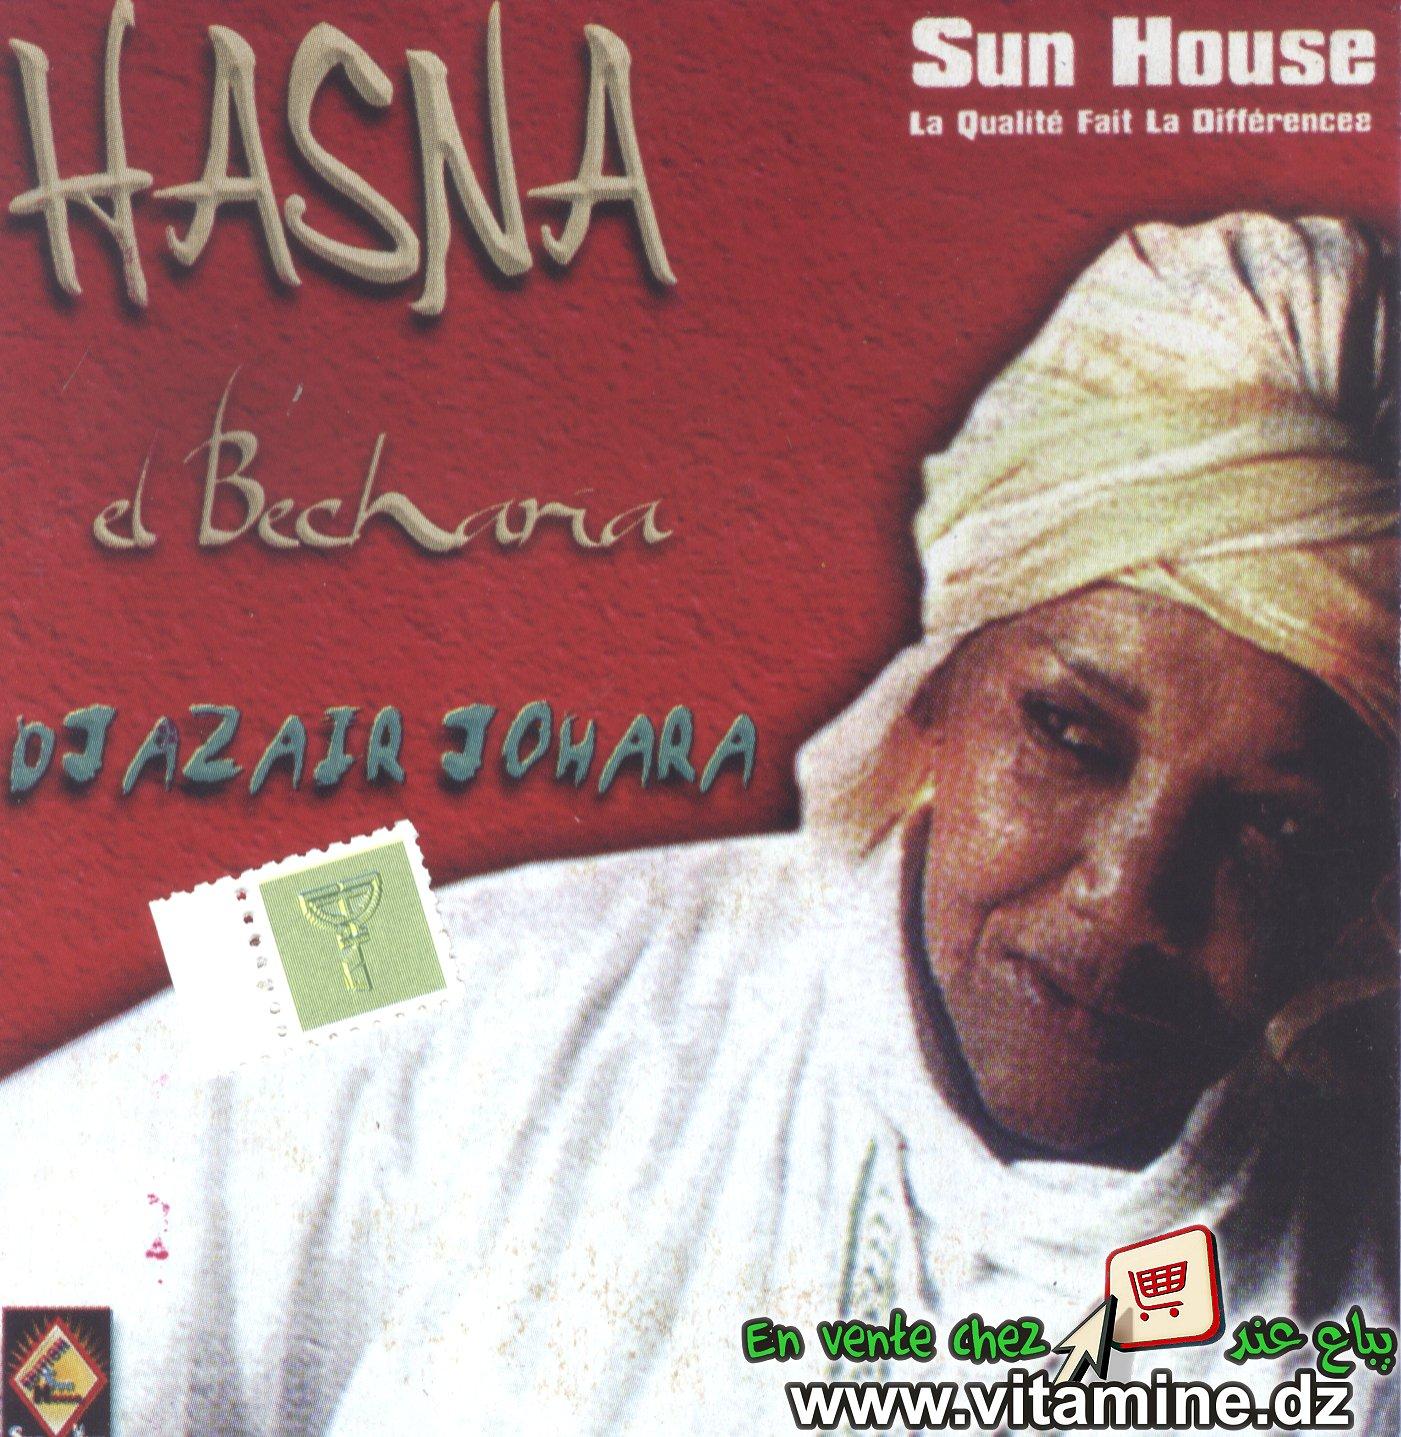 Hasna El Becharia - djazair johara